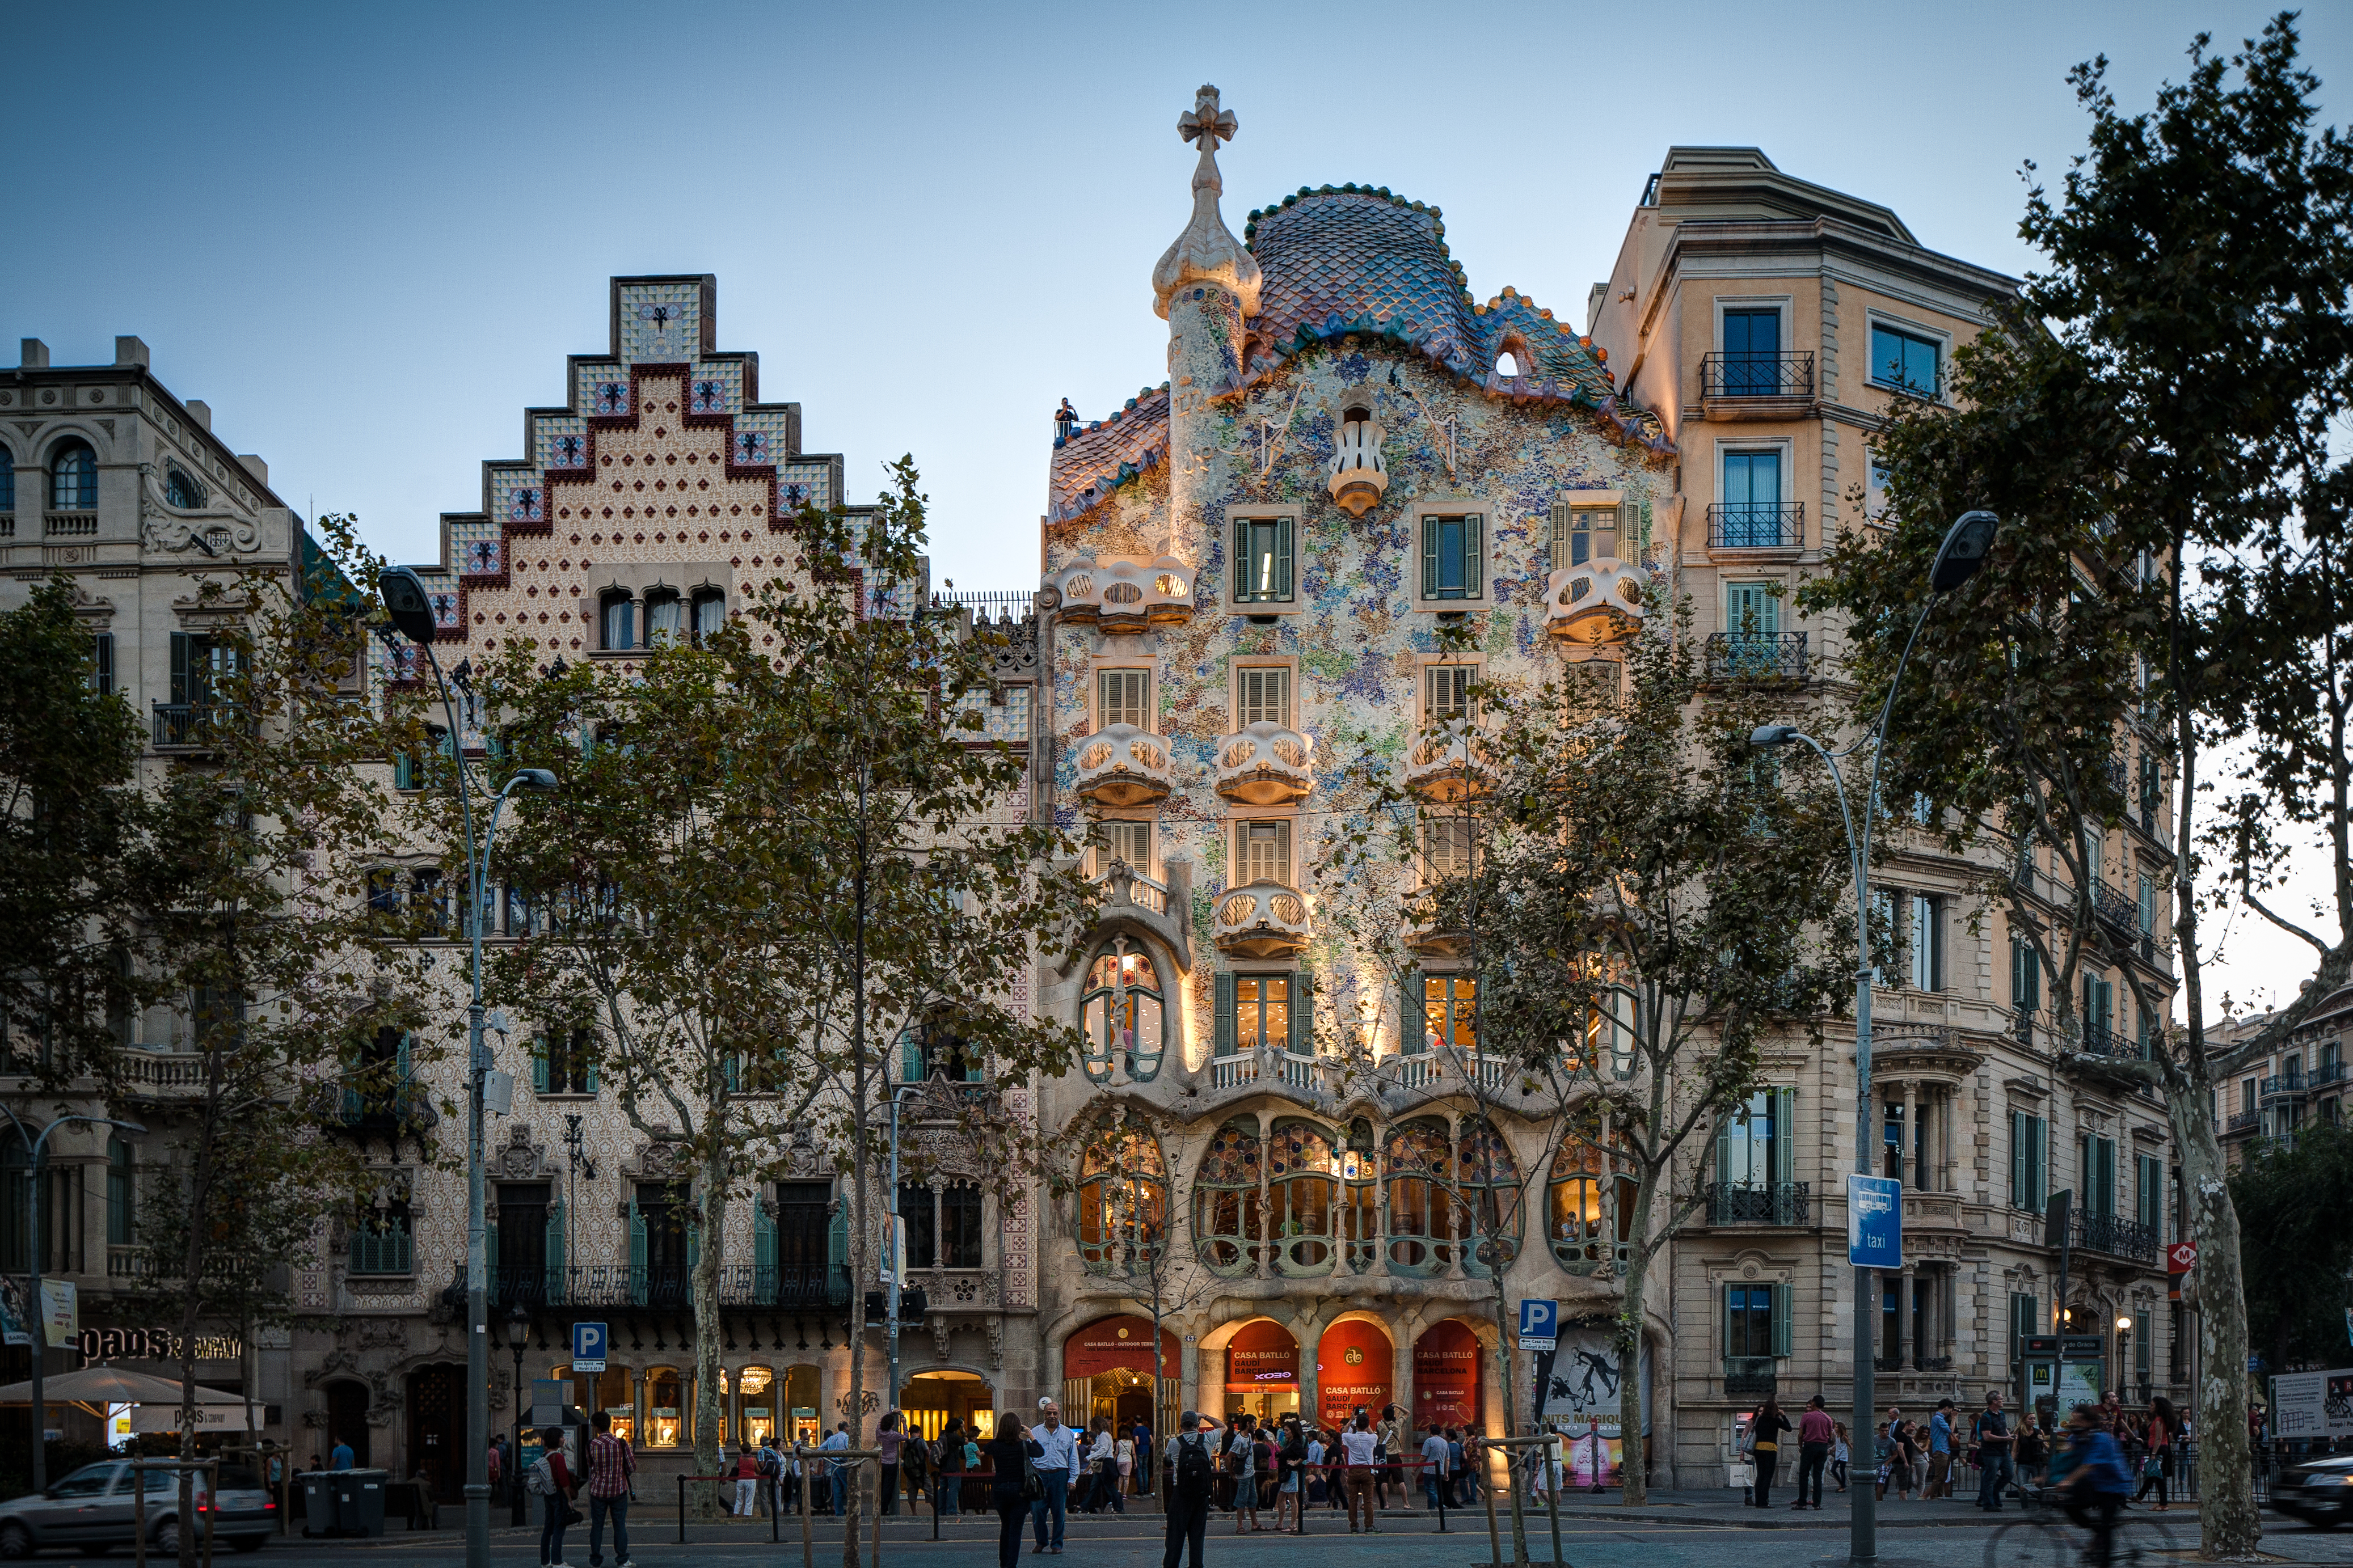 Casa_Batllo_Overview_Barcelona_Spain